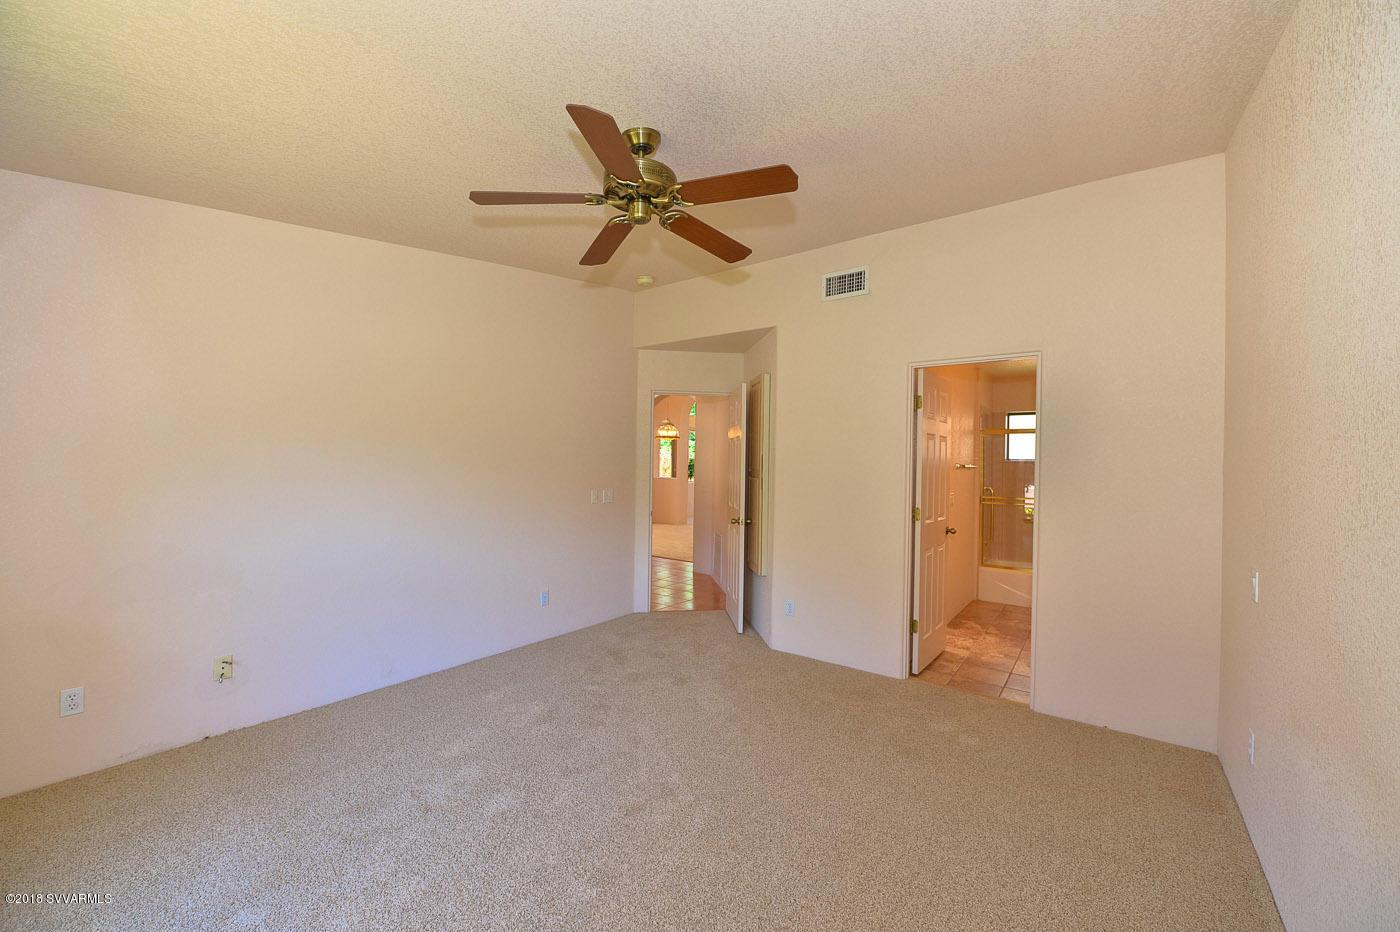 30 Arroyo Seco Drive Sedona, AZ 86336